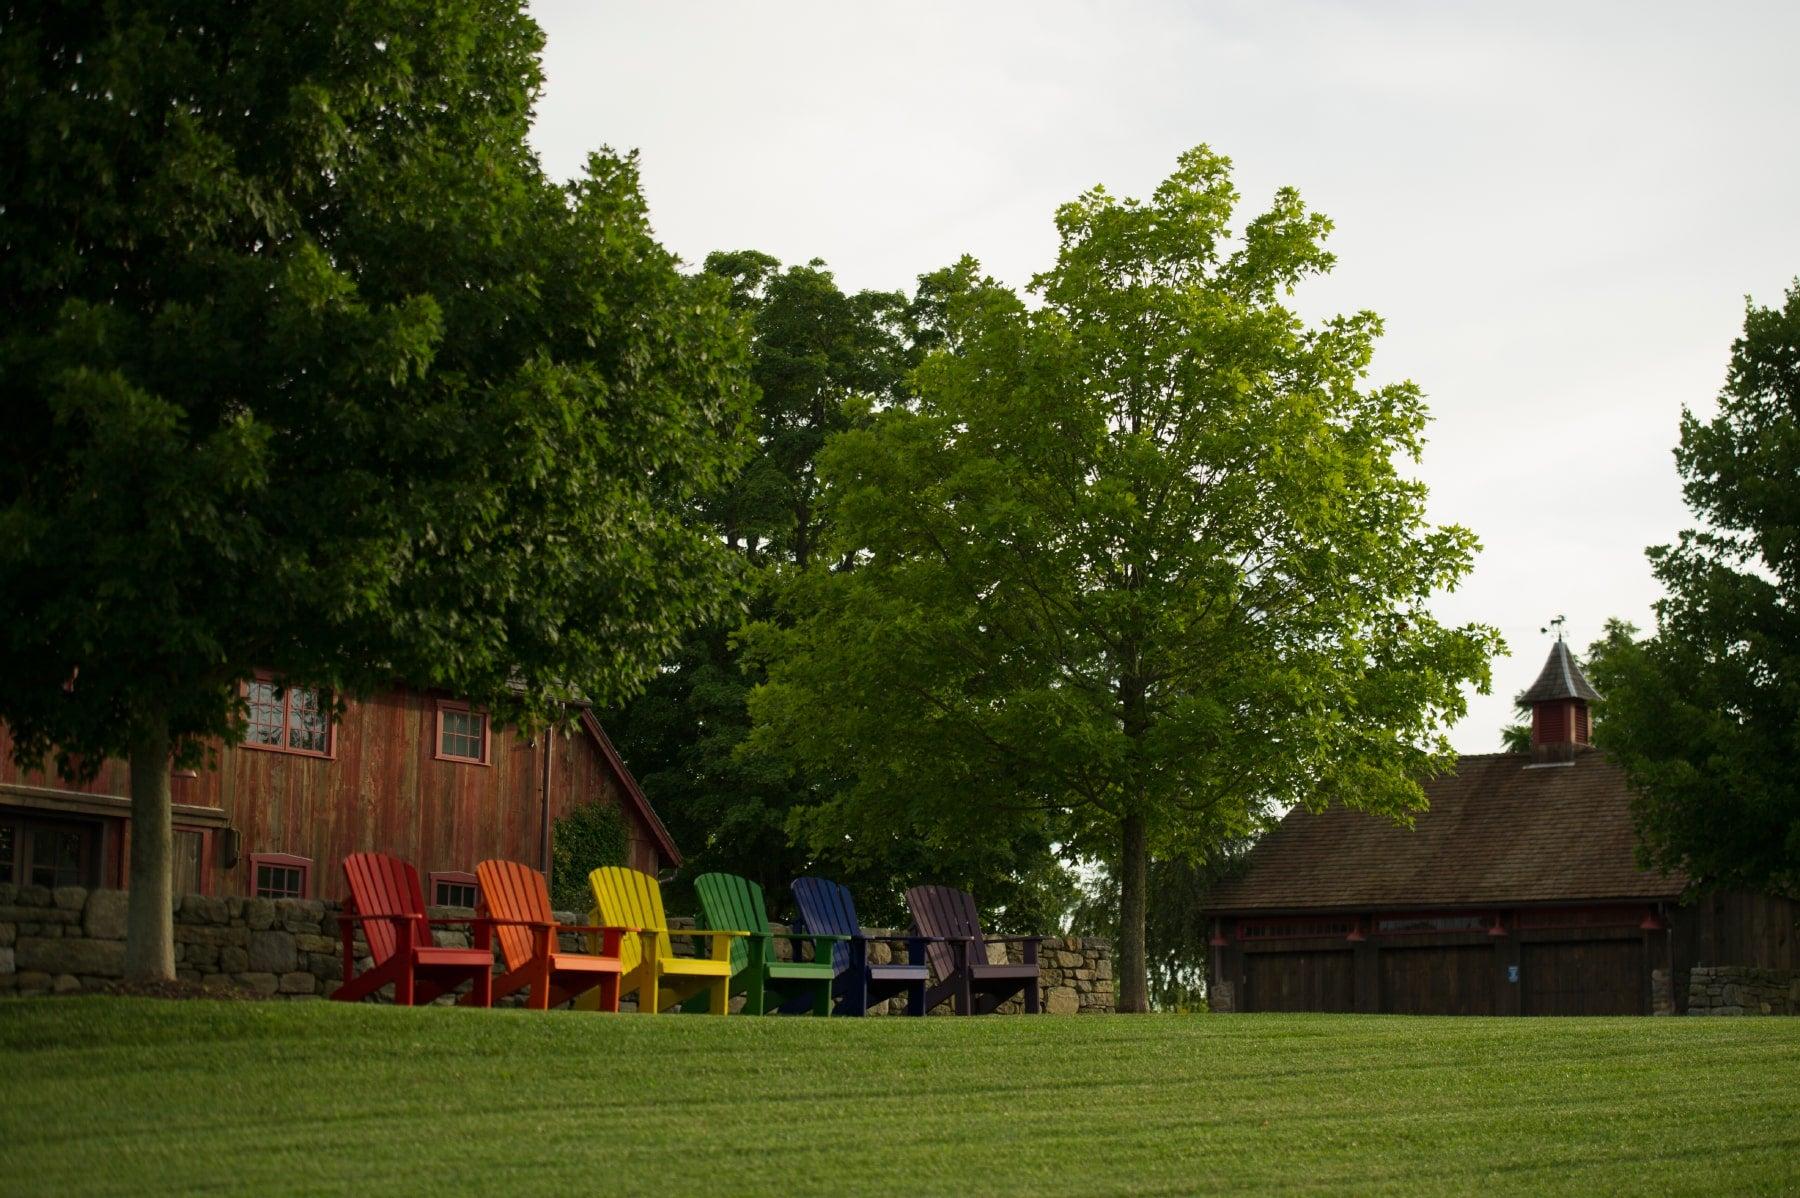 yard with rainbow adirondack chairs